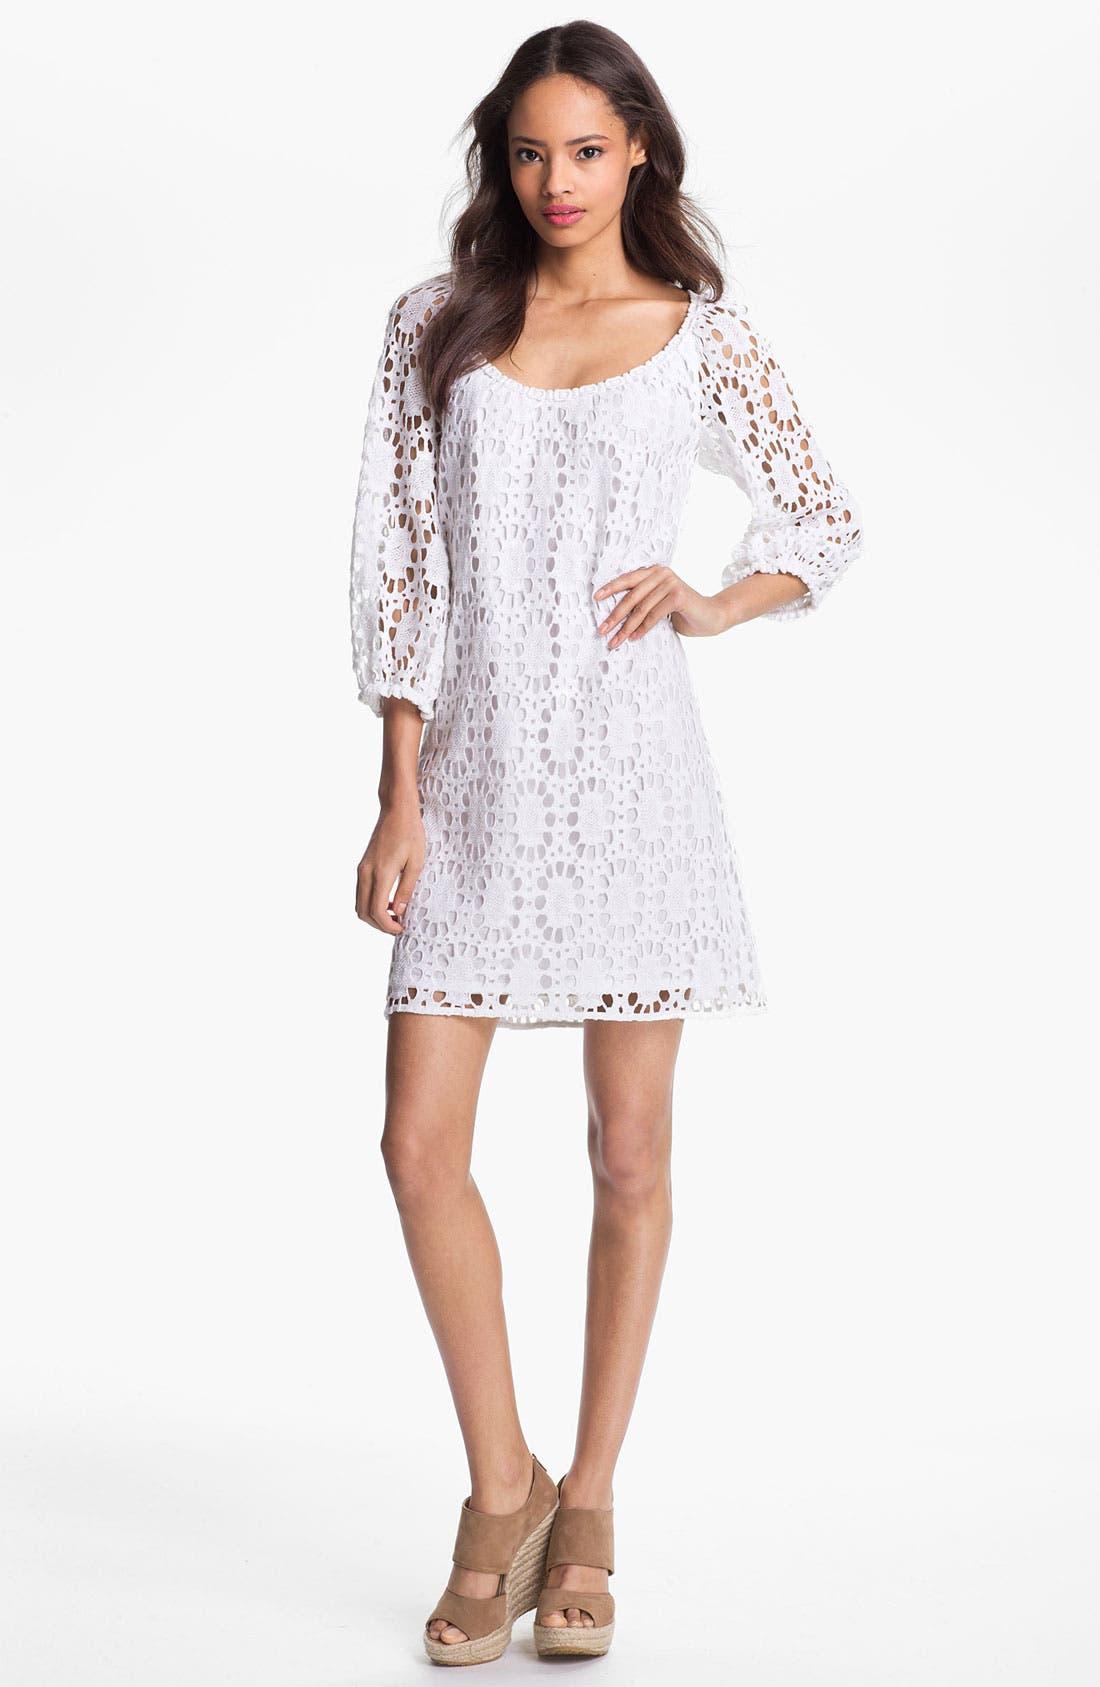 Alternate Image 1 Selected - Trina Turk 'Wakeboard' Lace Shift Dress